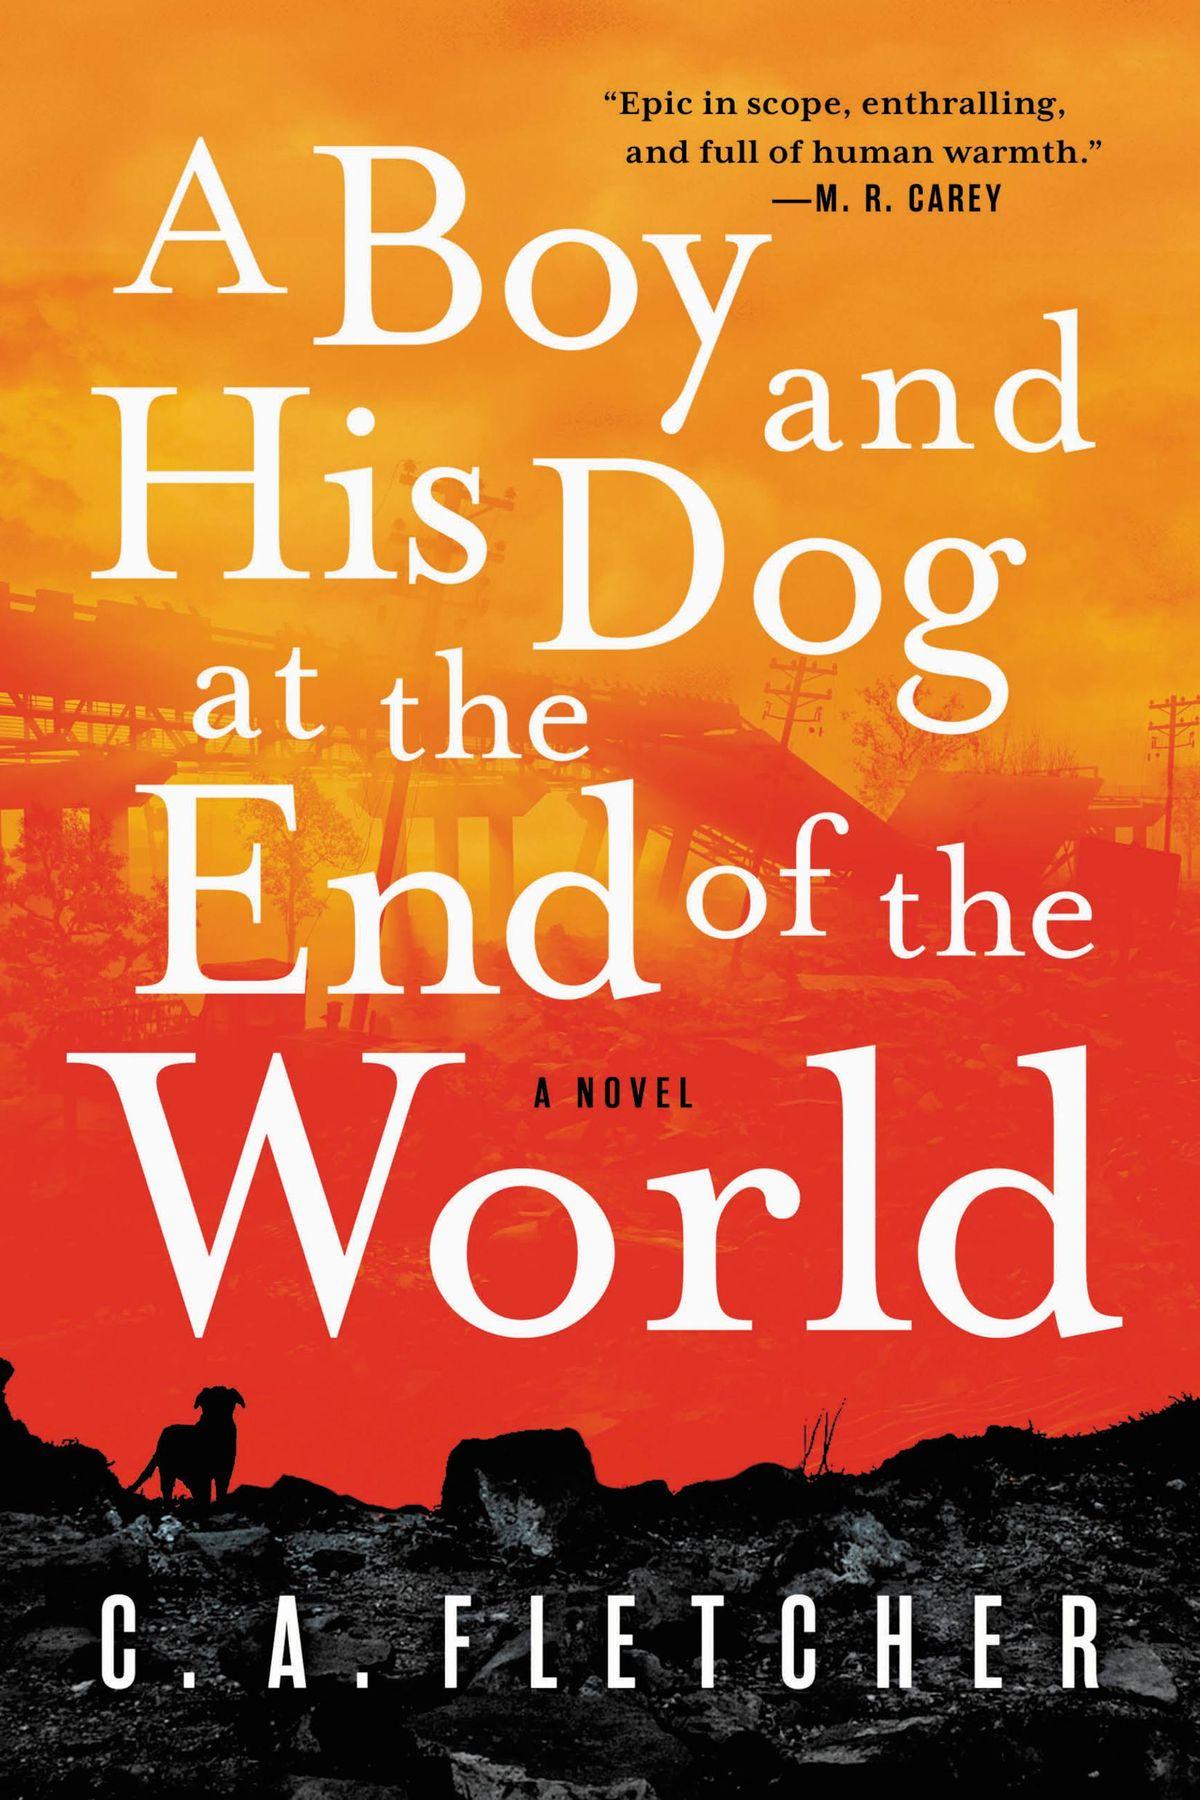 «A Boy and His Dog at the End of the World», de C. A. Fletcher